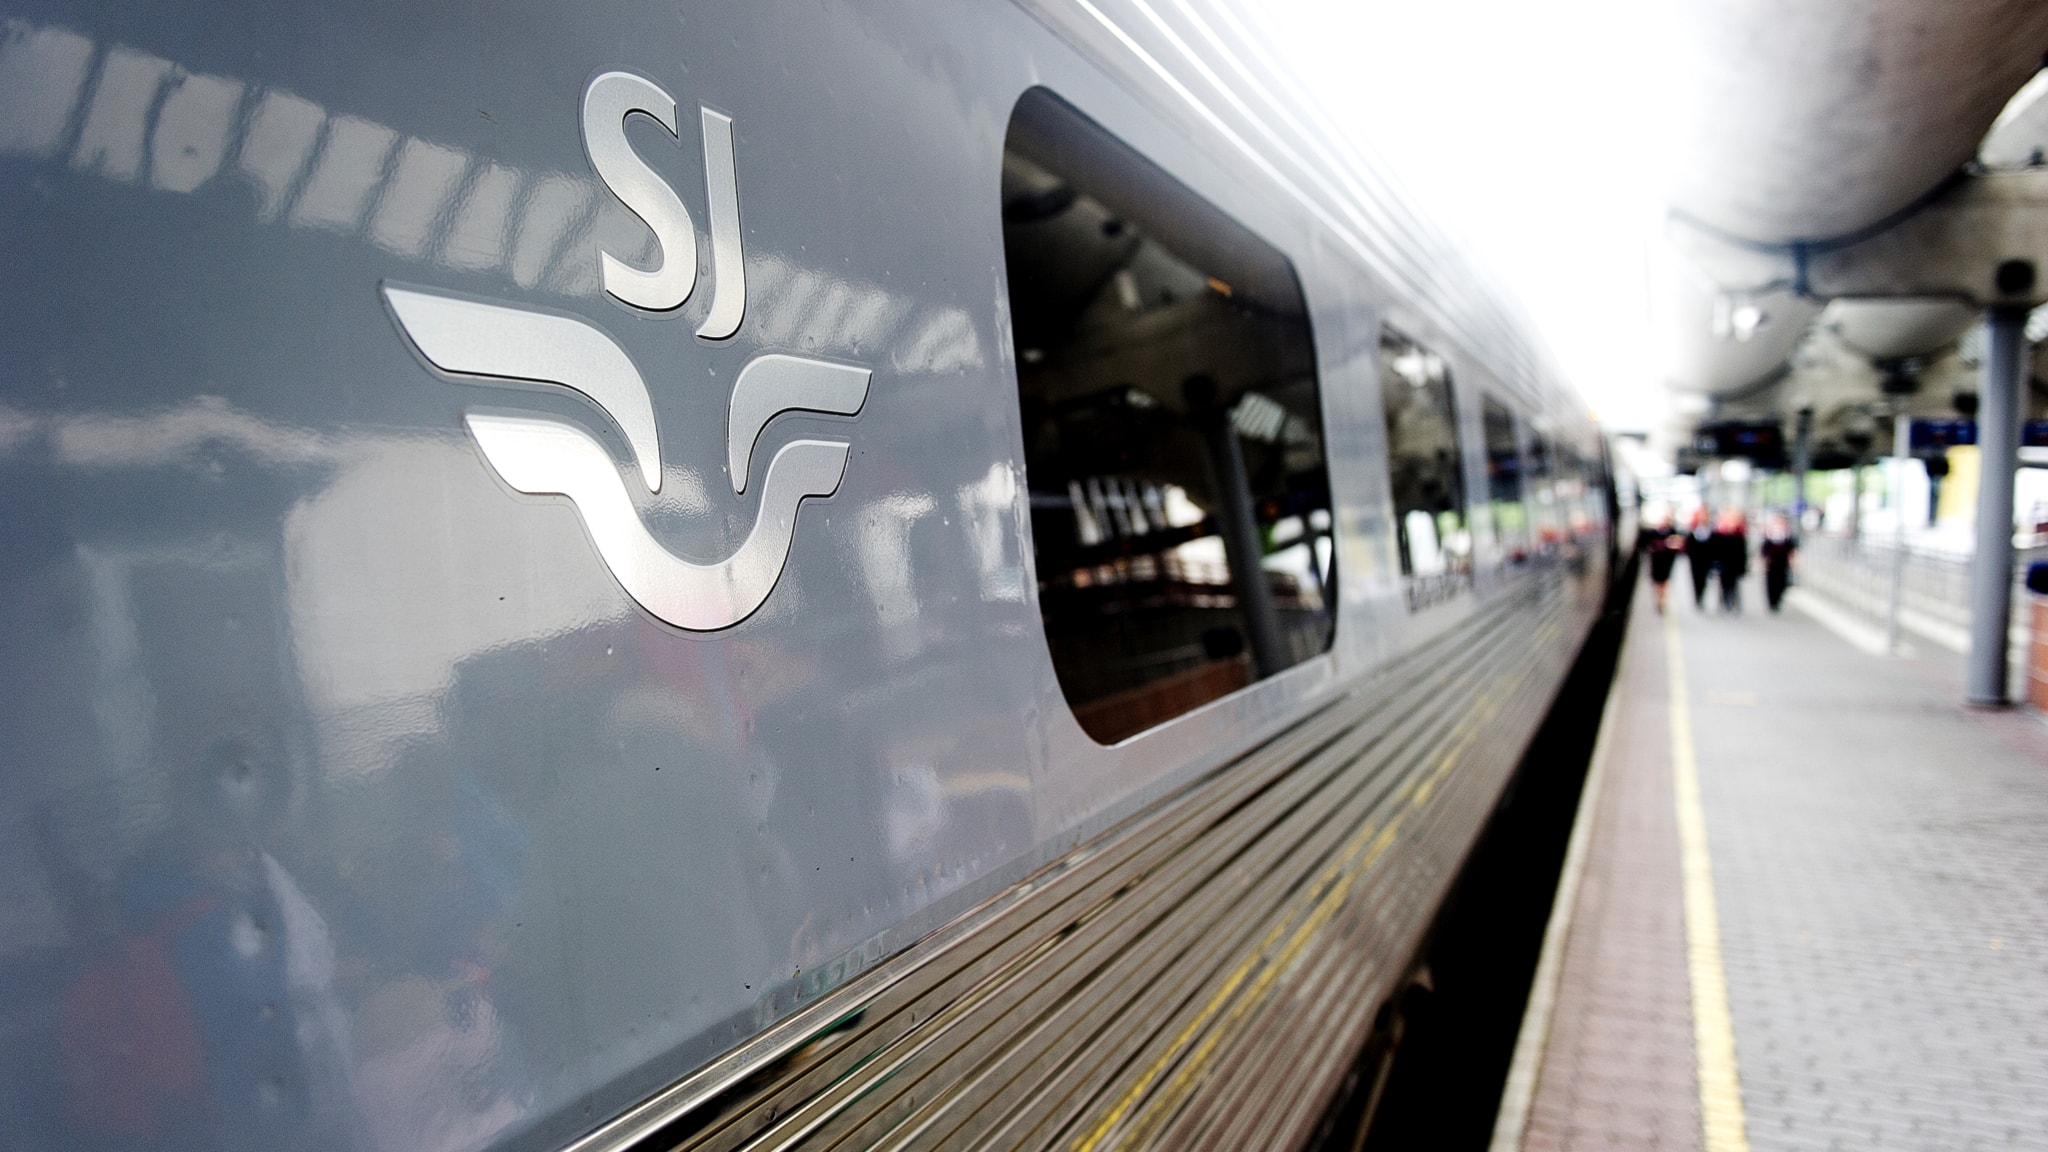 Nuvarande tåg i drift på linjen Stockholm-Oslo